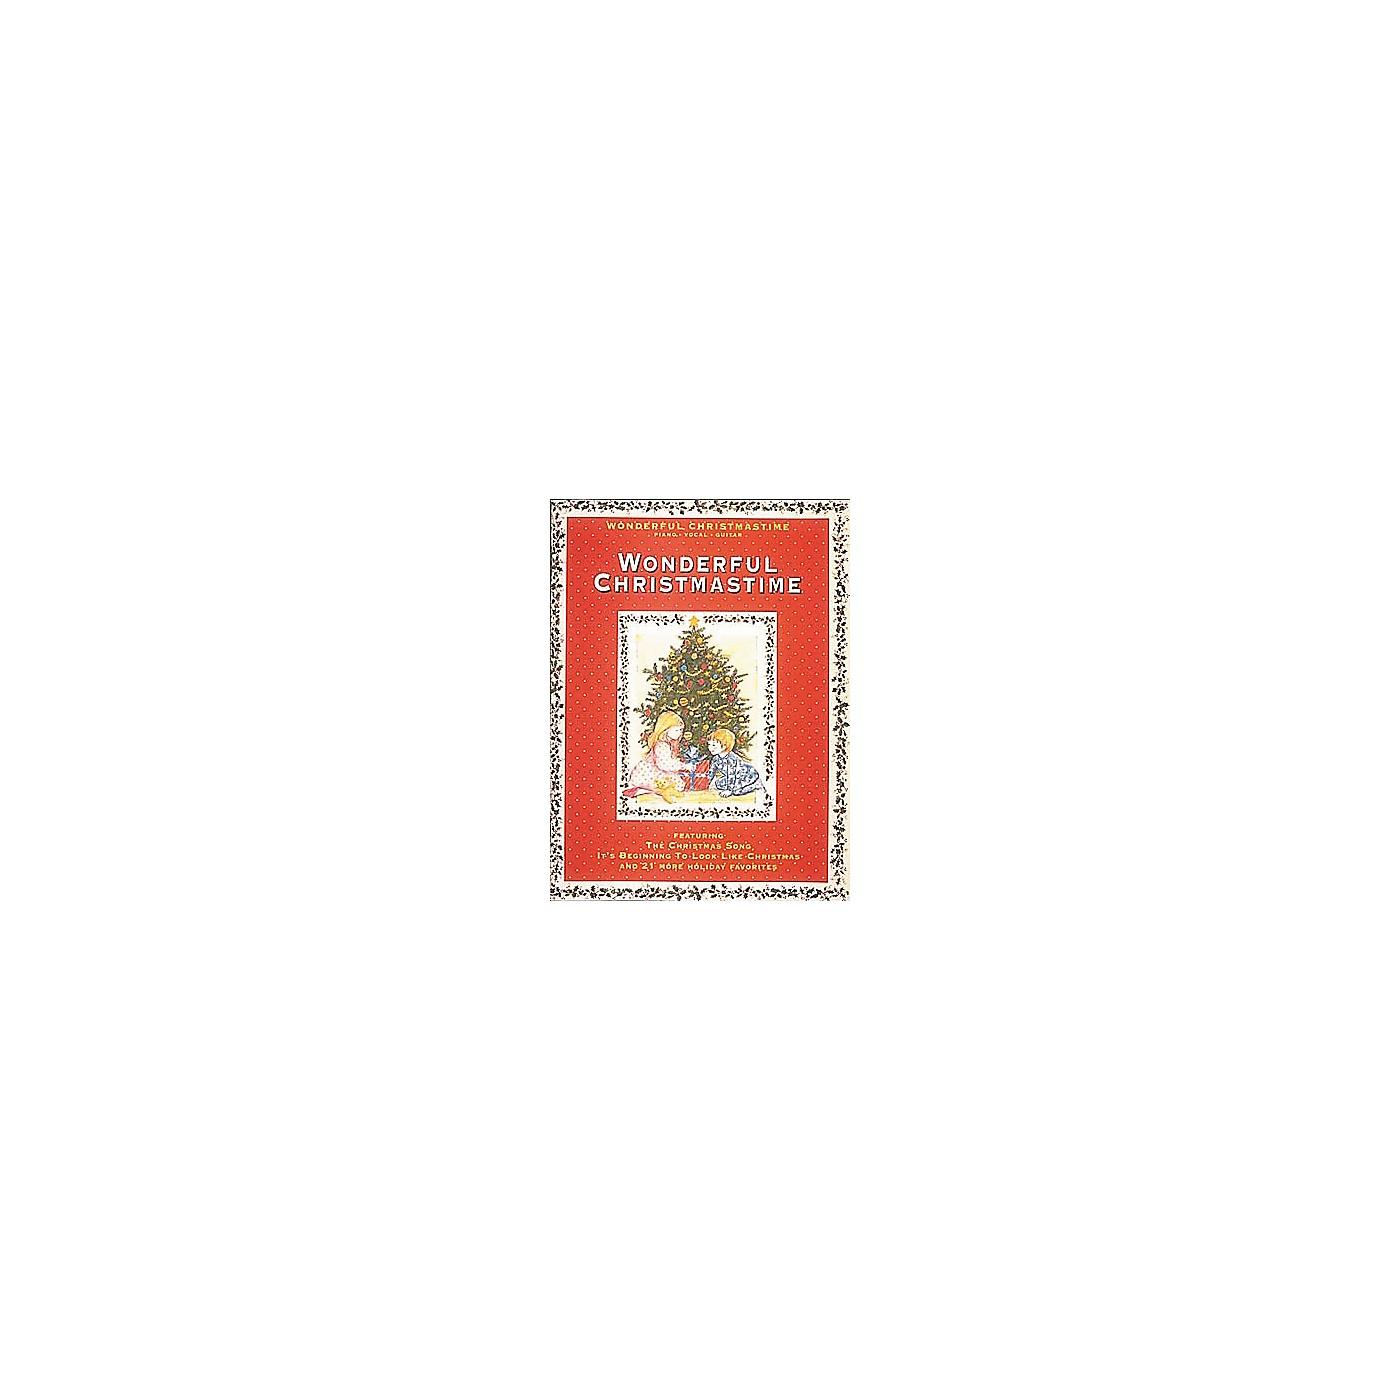 Hal Leonard Wonderful Christmastime Piano, Vocal, Guitar Songbook thumbnail